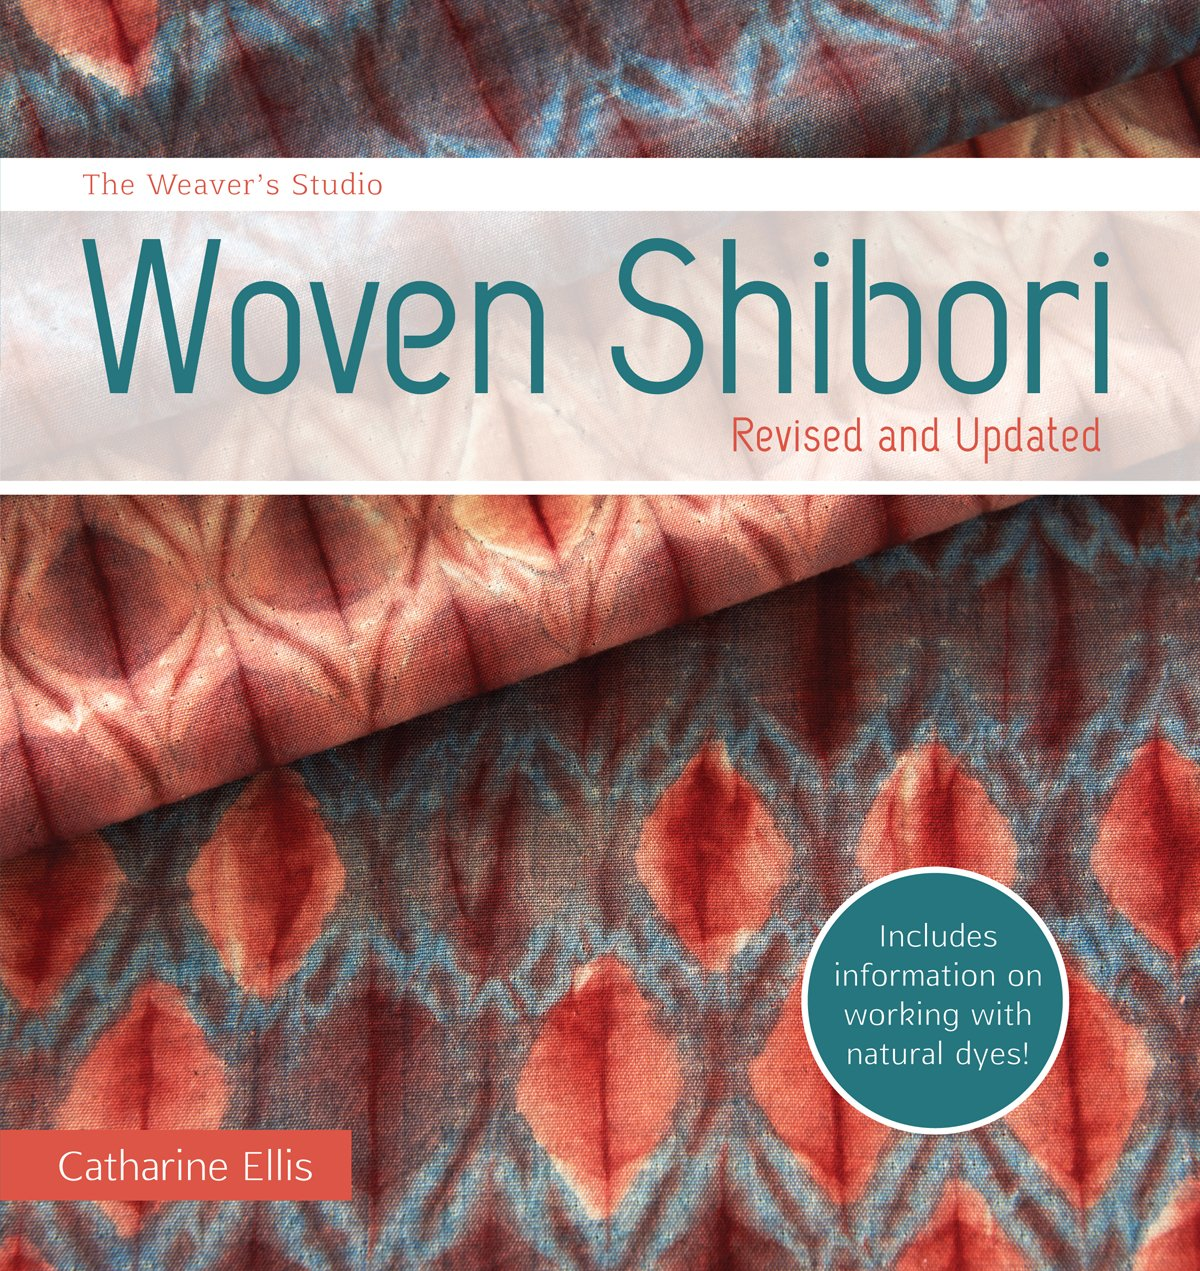 The Weaver's Studio - Woven Shibori: Revised and Updated